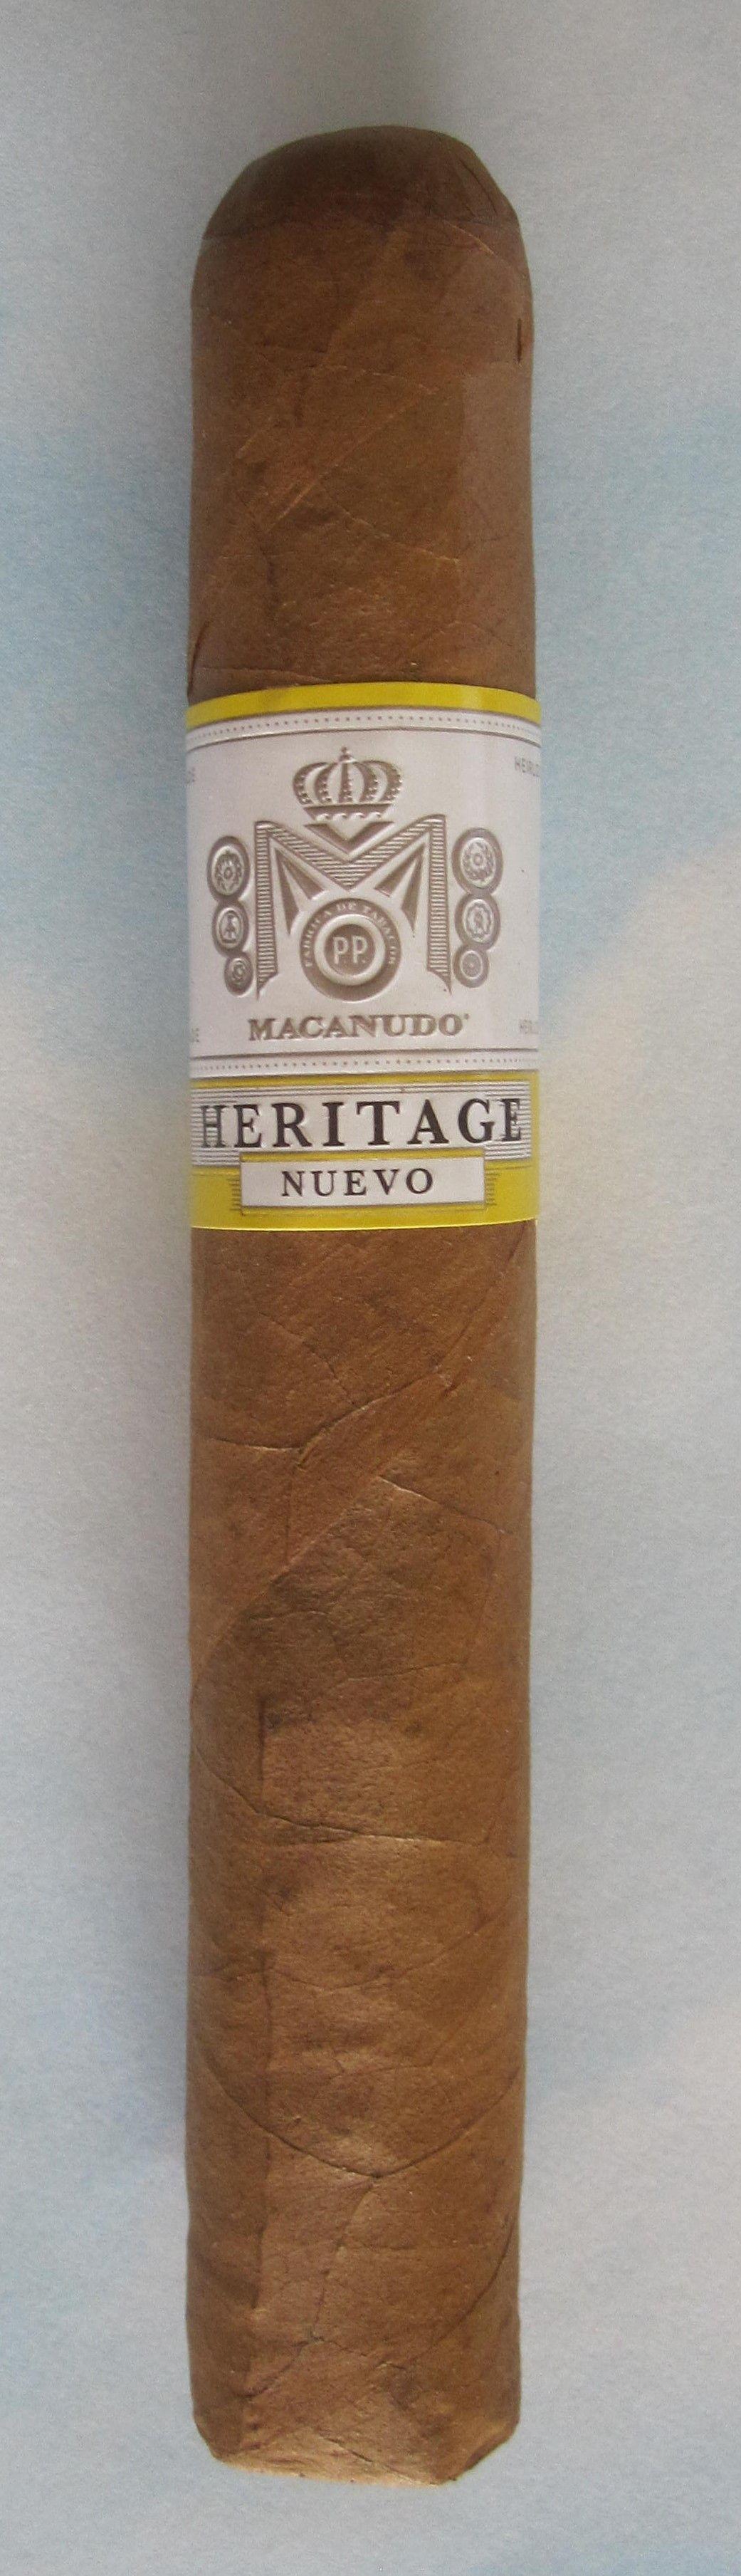 Macanudo Heritage Nuevo Cigar